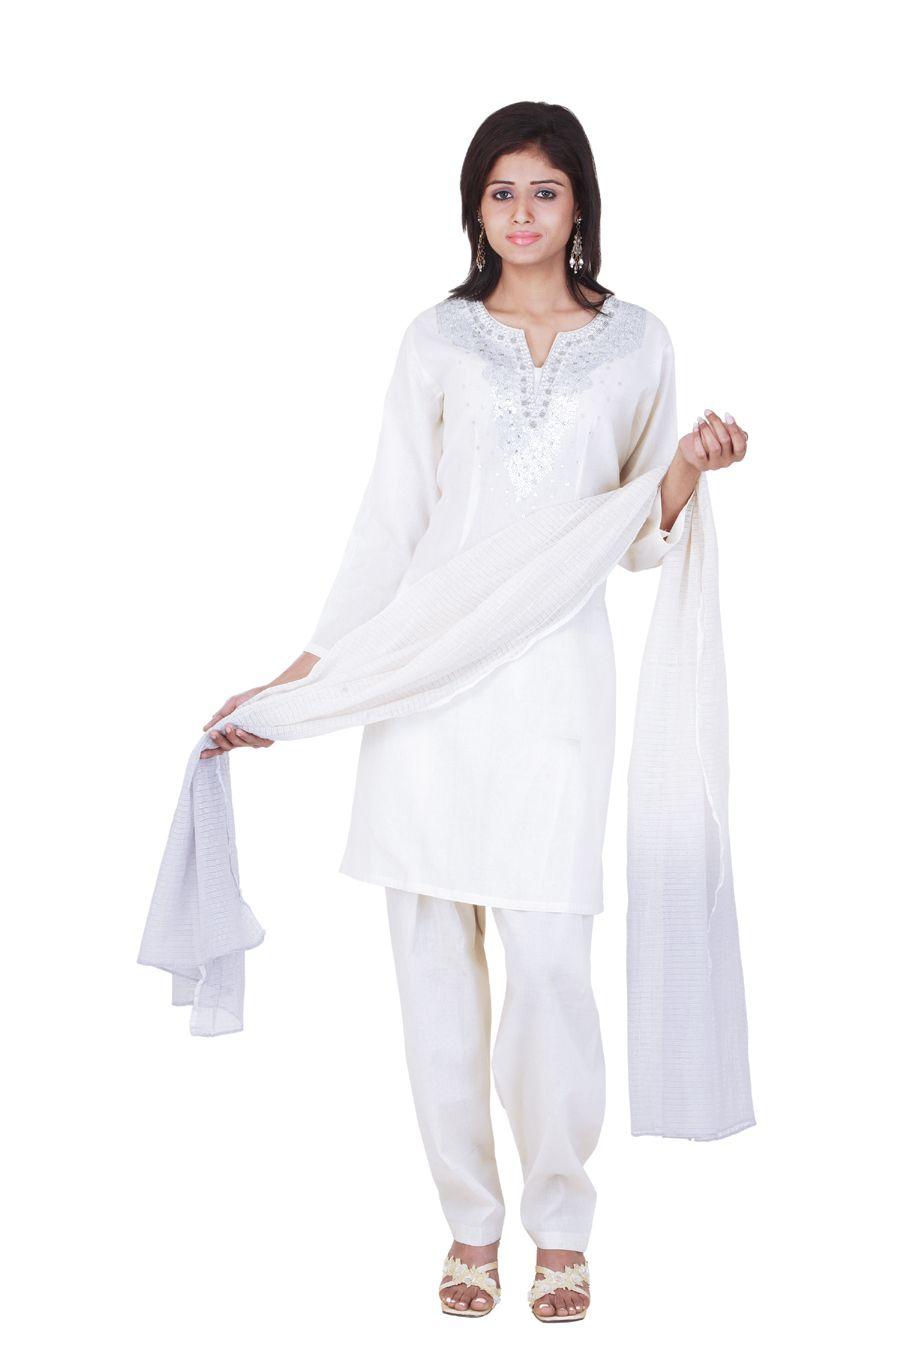 white churidar suit for women - Google Search | Wedding ...